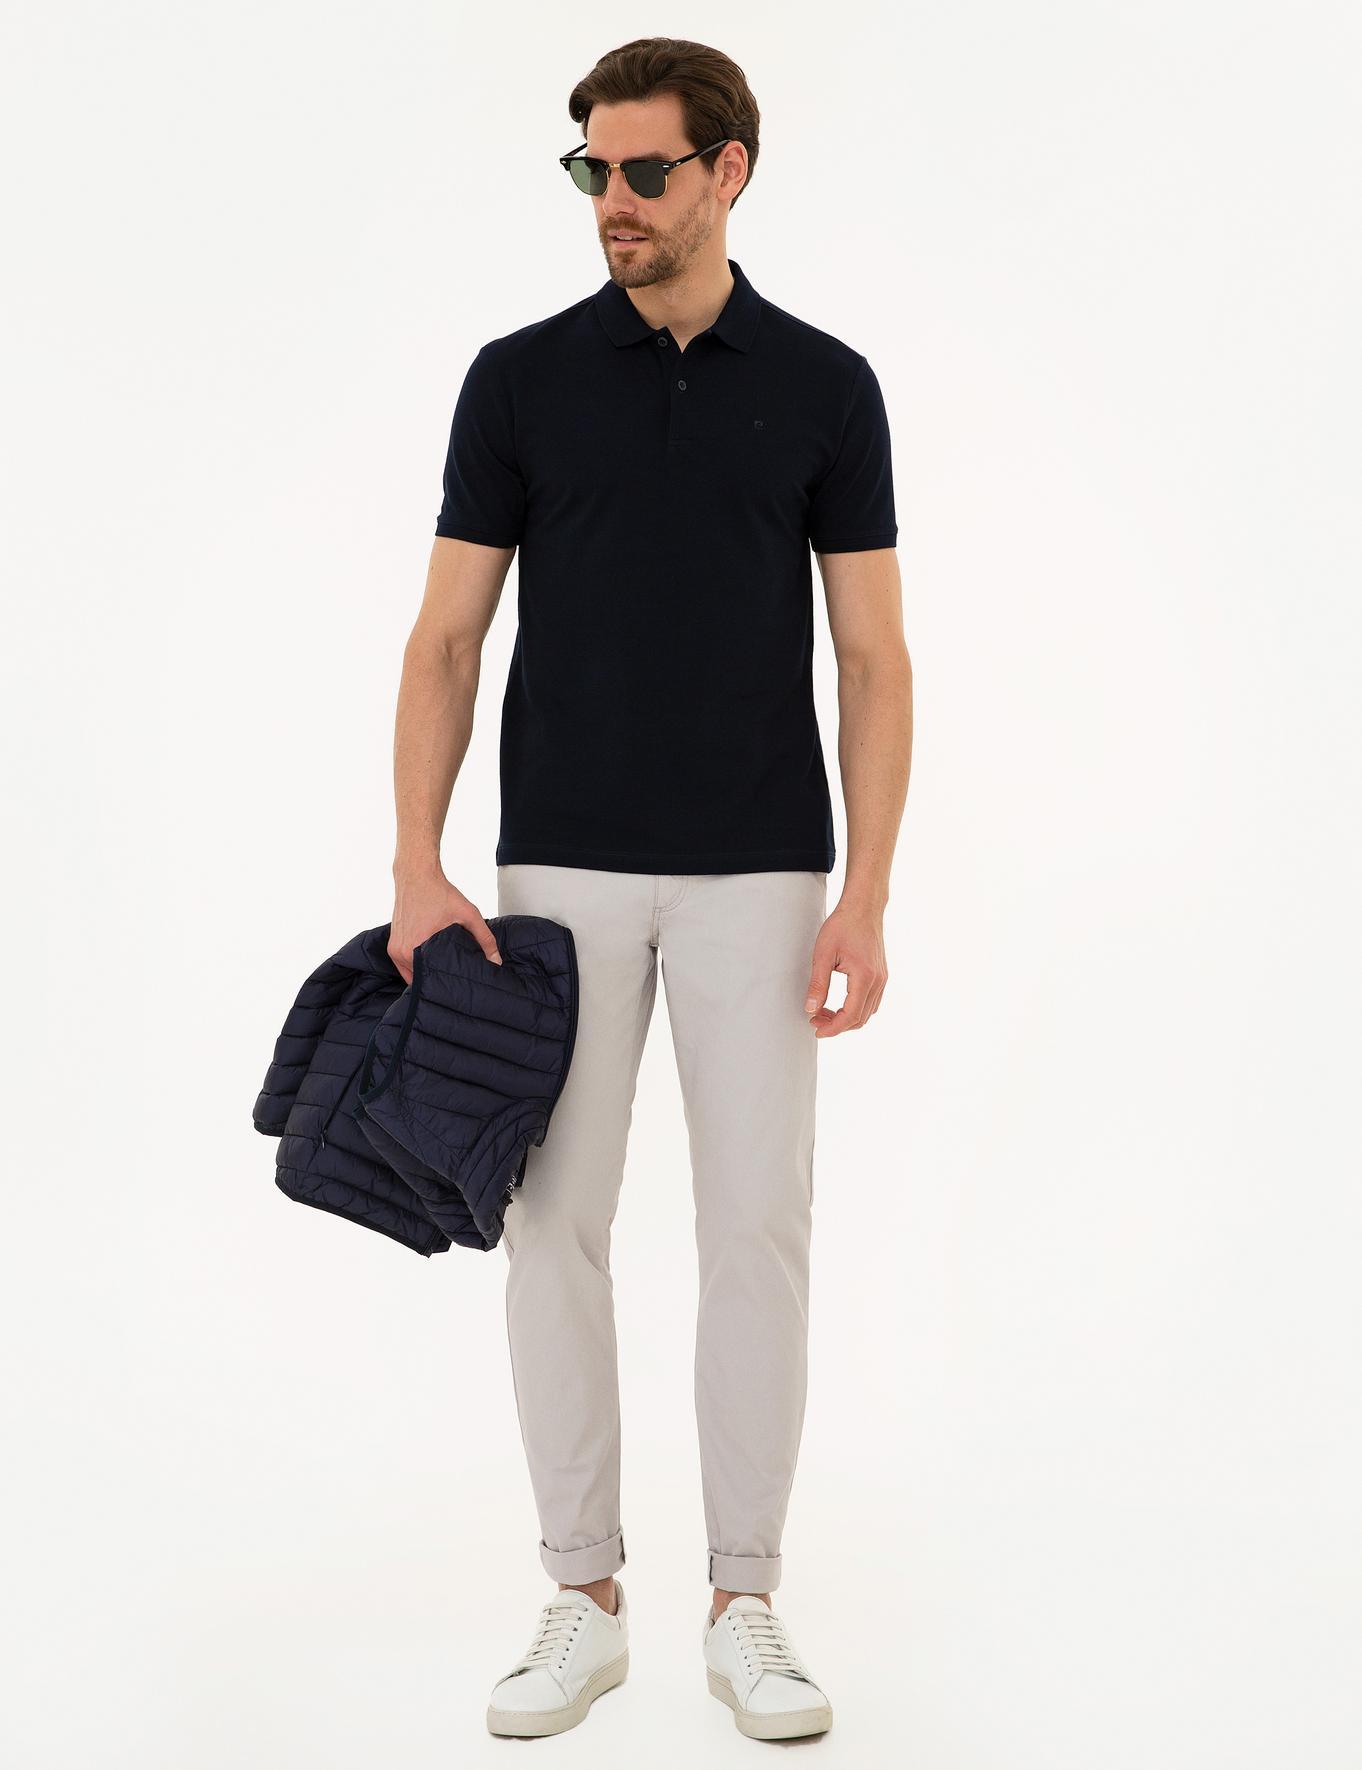 Koyu Lacivert Slim Fit Polo Yaka T-Shirt